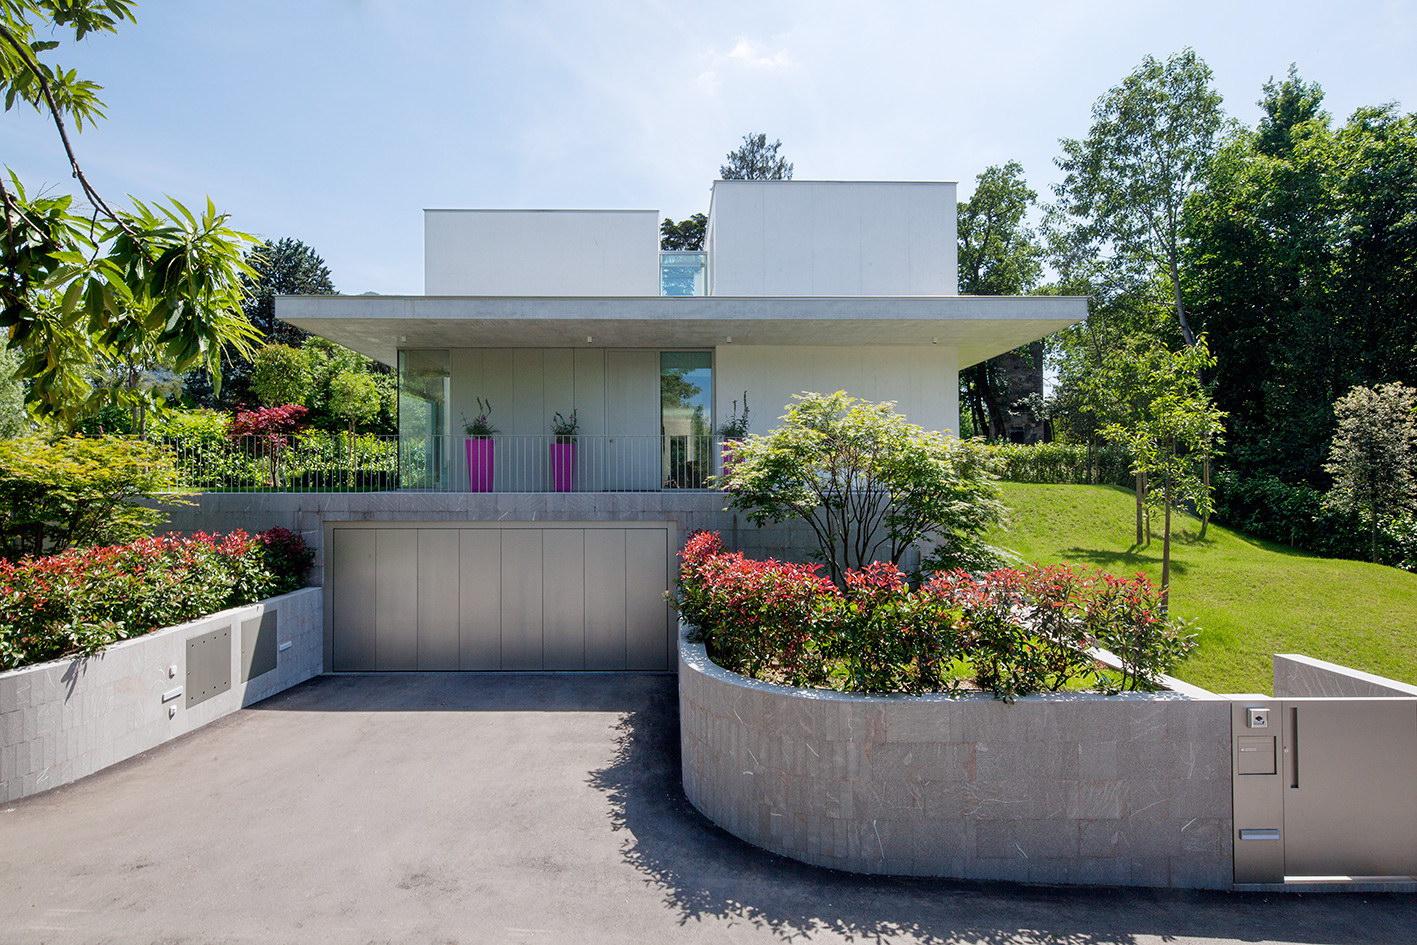 Villa G – Family House in Lugano by SCAPE